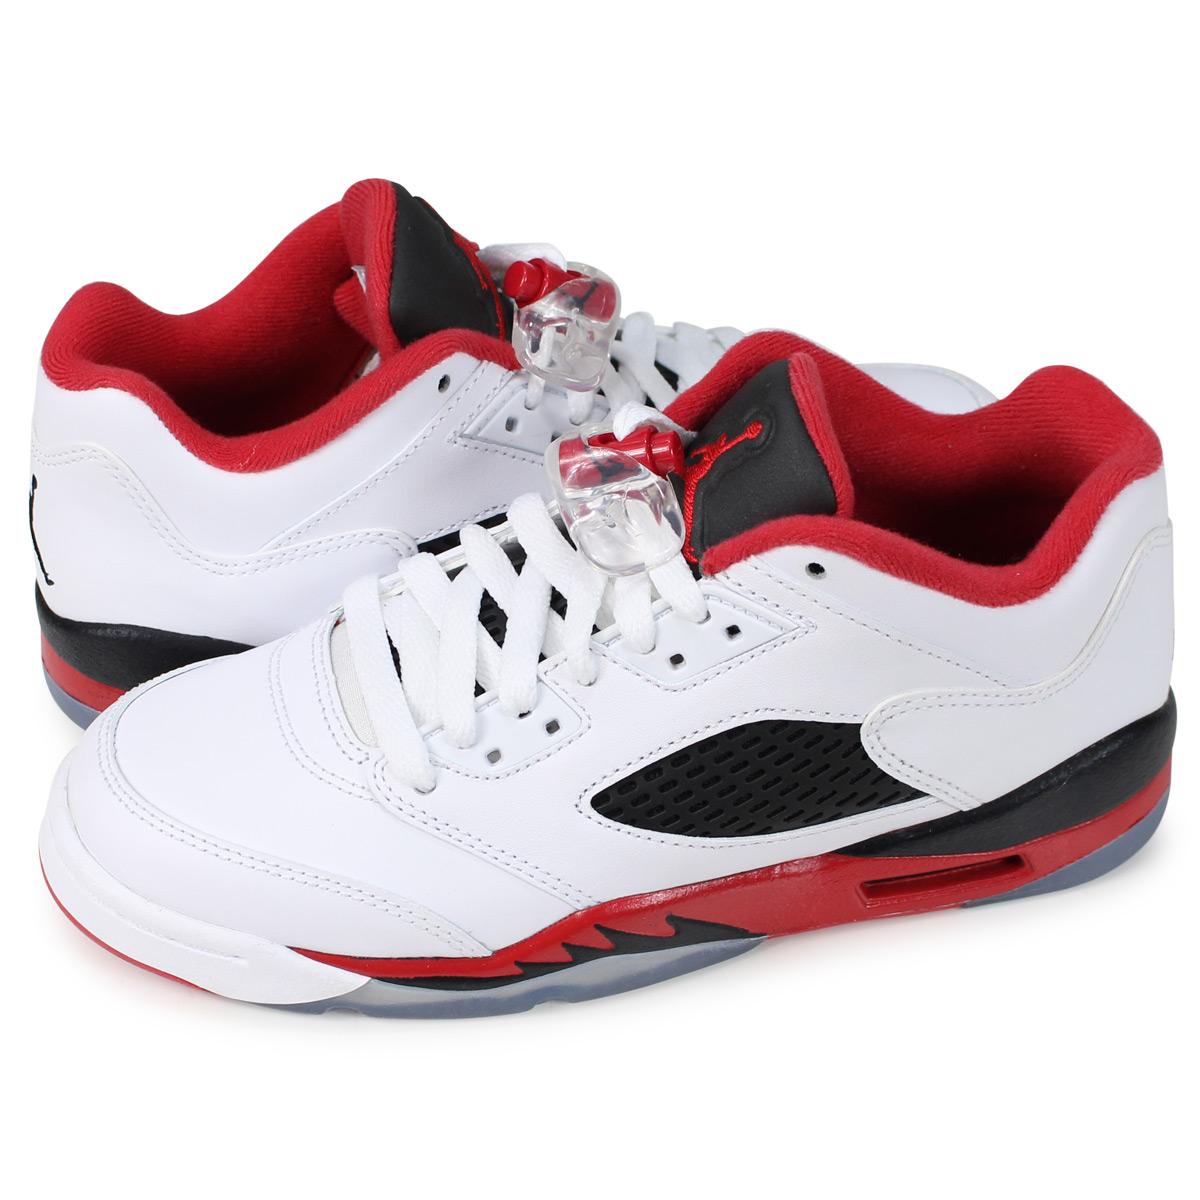 sale retailer 655a8 44bef Nike NIKE Air Jordan 5 nostalgic lady's sneakers AIR JORDAN 5 RETRO LOW GS  FIRE RED ...